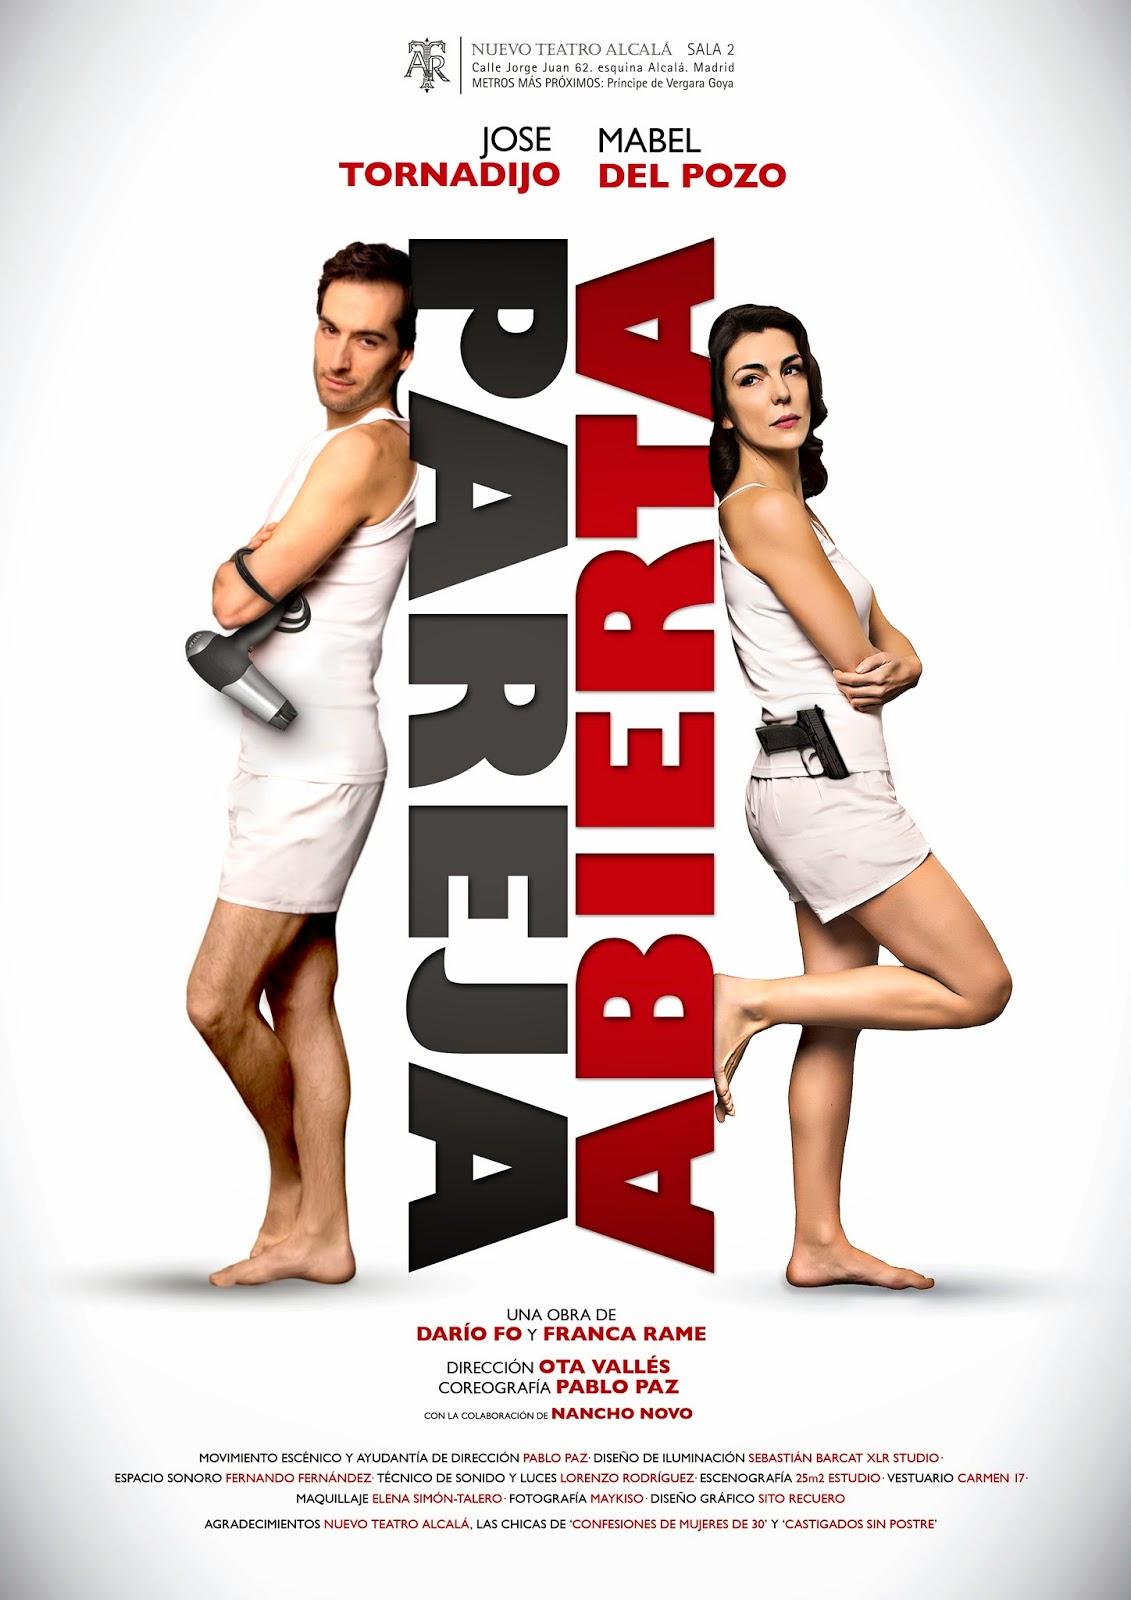 Pareja-Abierta-teatro-Nuevo-Alcalá